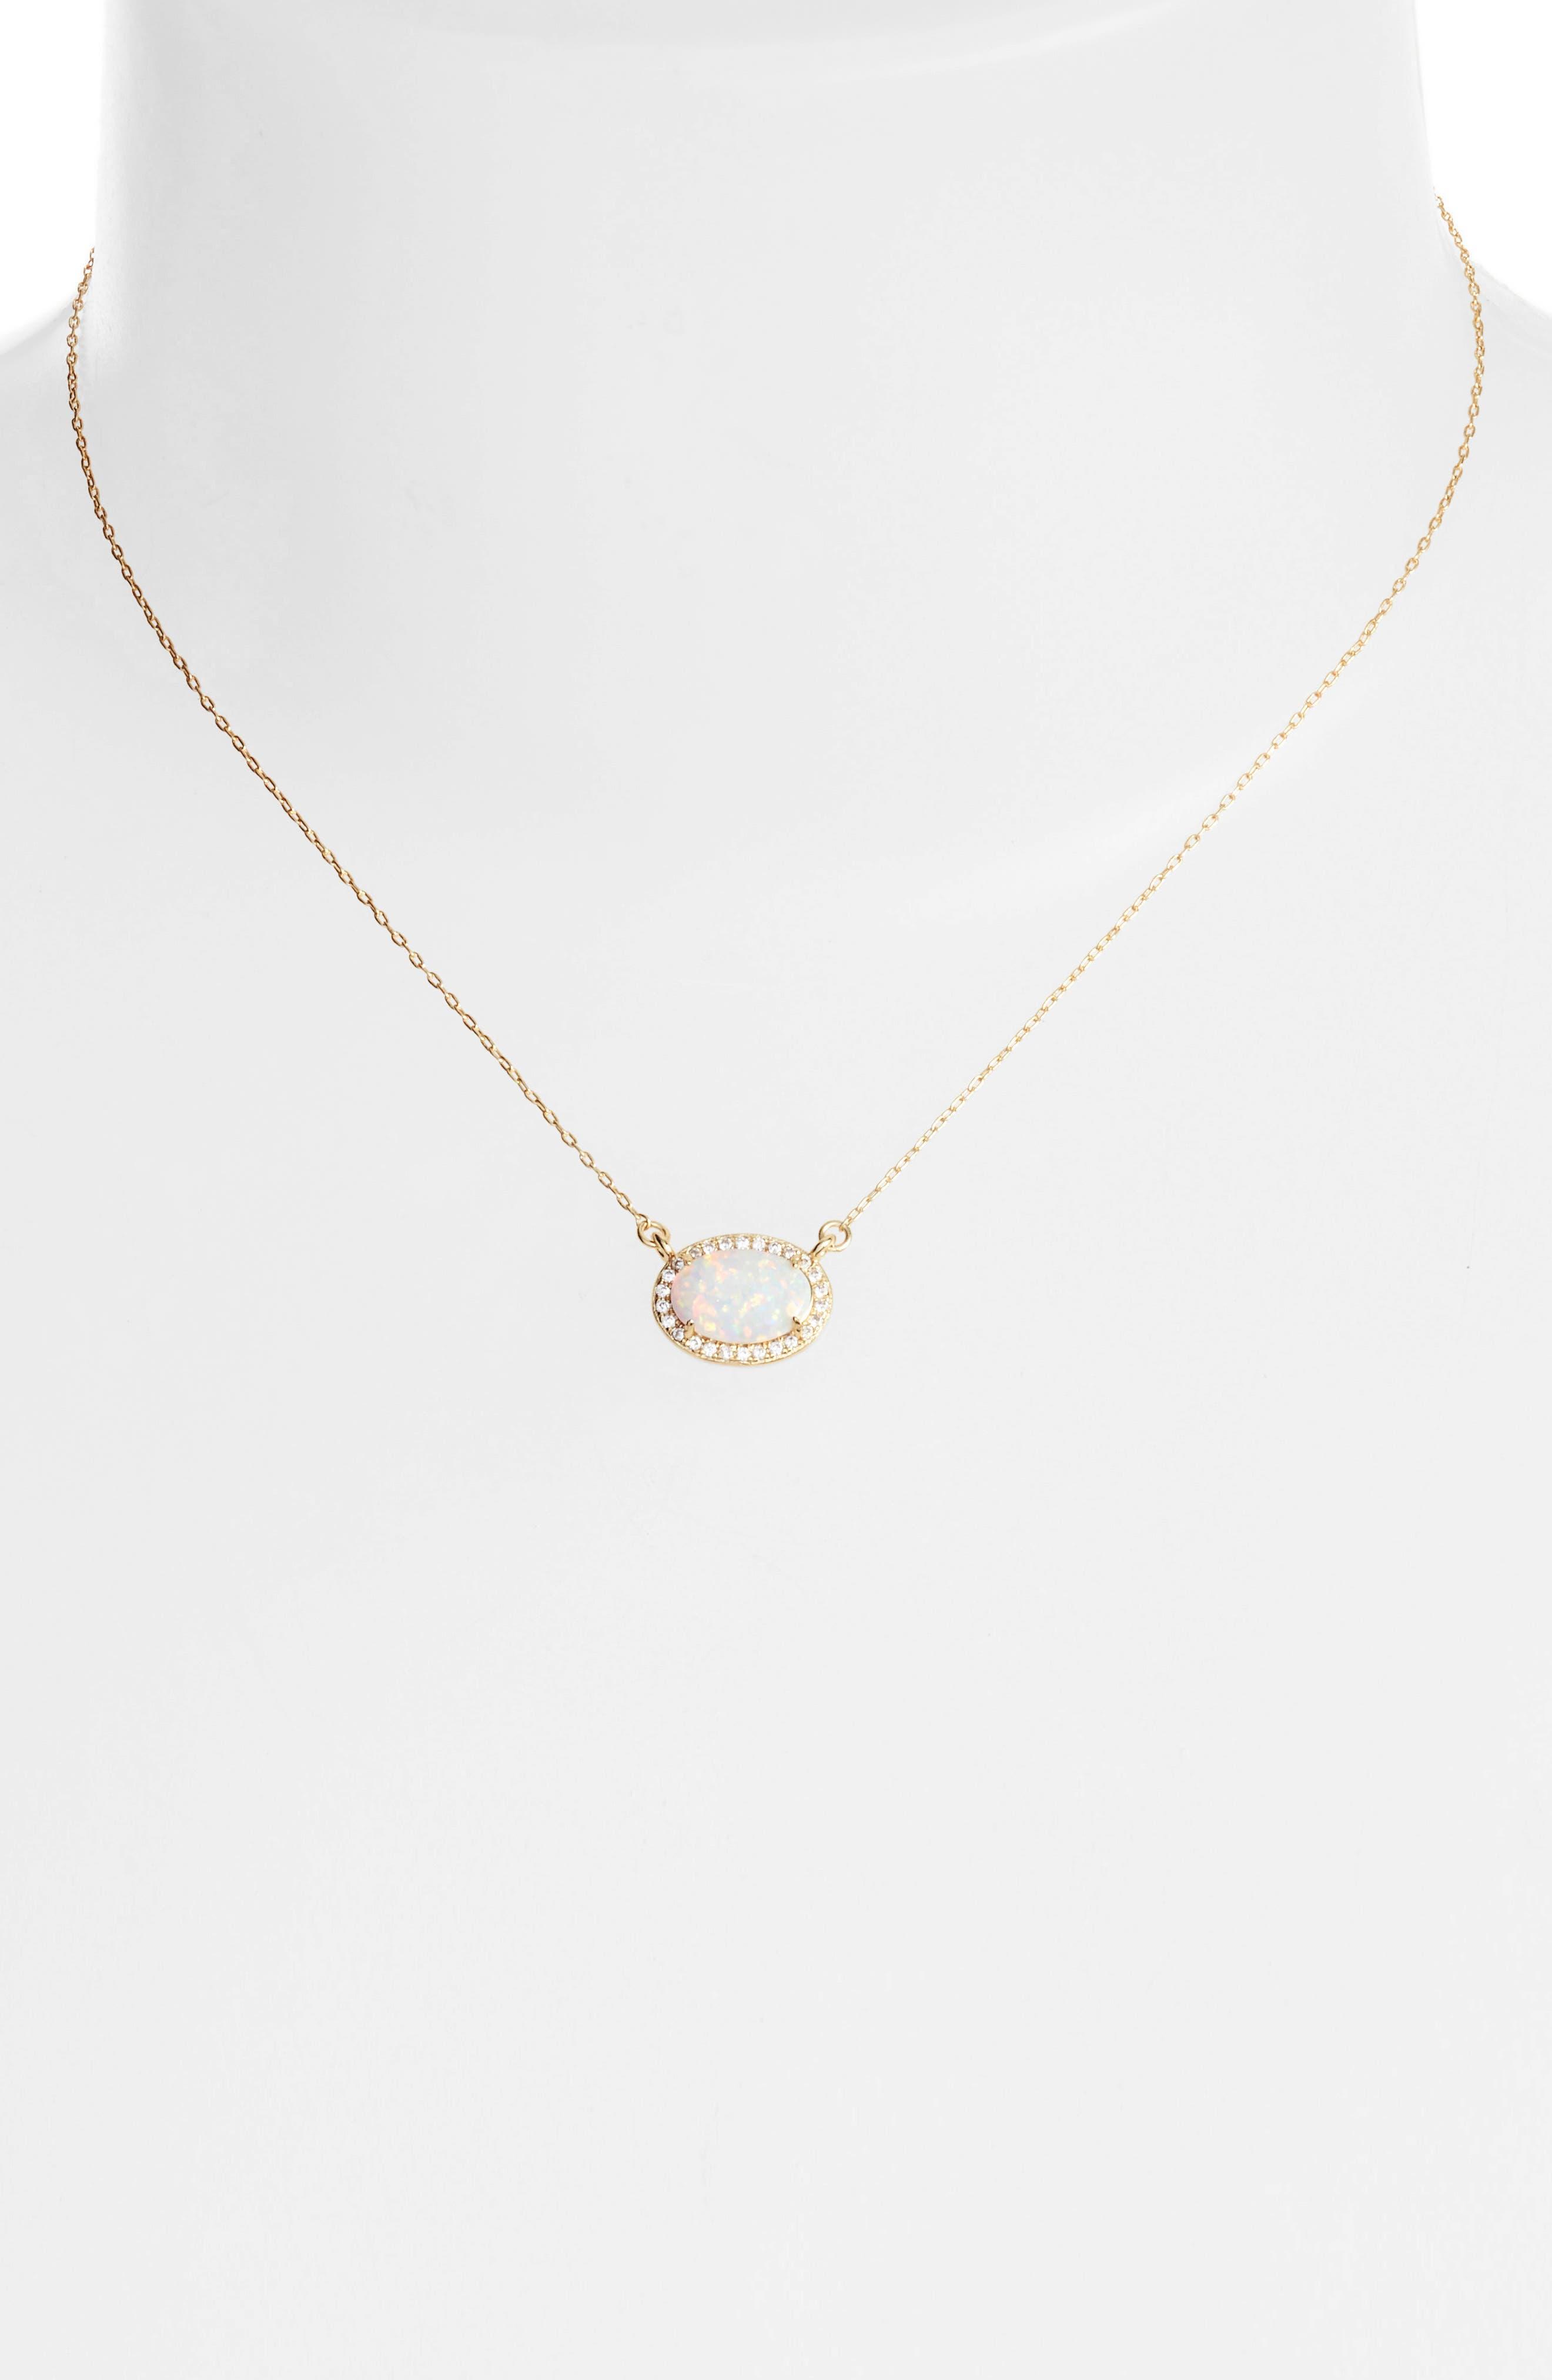 MELINDA MARIA, Ciera Opal Pendant Necklace, Alternate thumbnail 2, color, 710